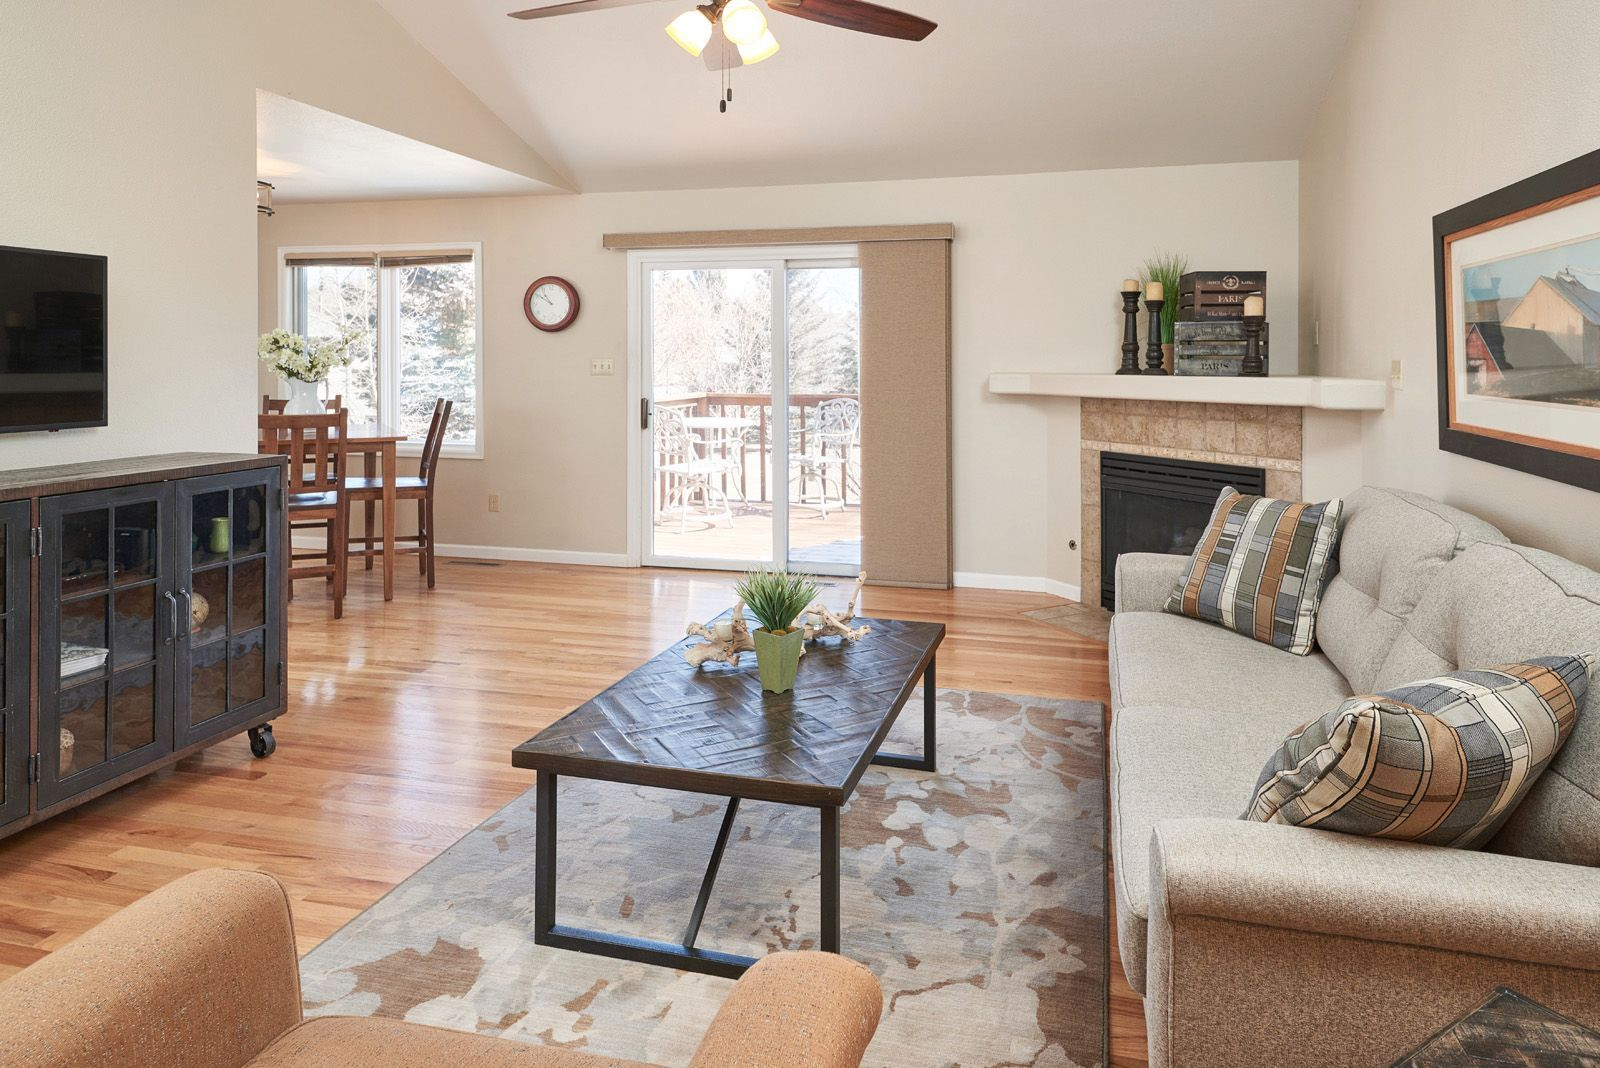 We See You Deck Furniture It Won T Be Long 6403 Prairie Hills Drive Cheyenne Wyoming Bit Ly 6403prairiehi Livingroom Layout Living Spaces Deck Furniture